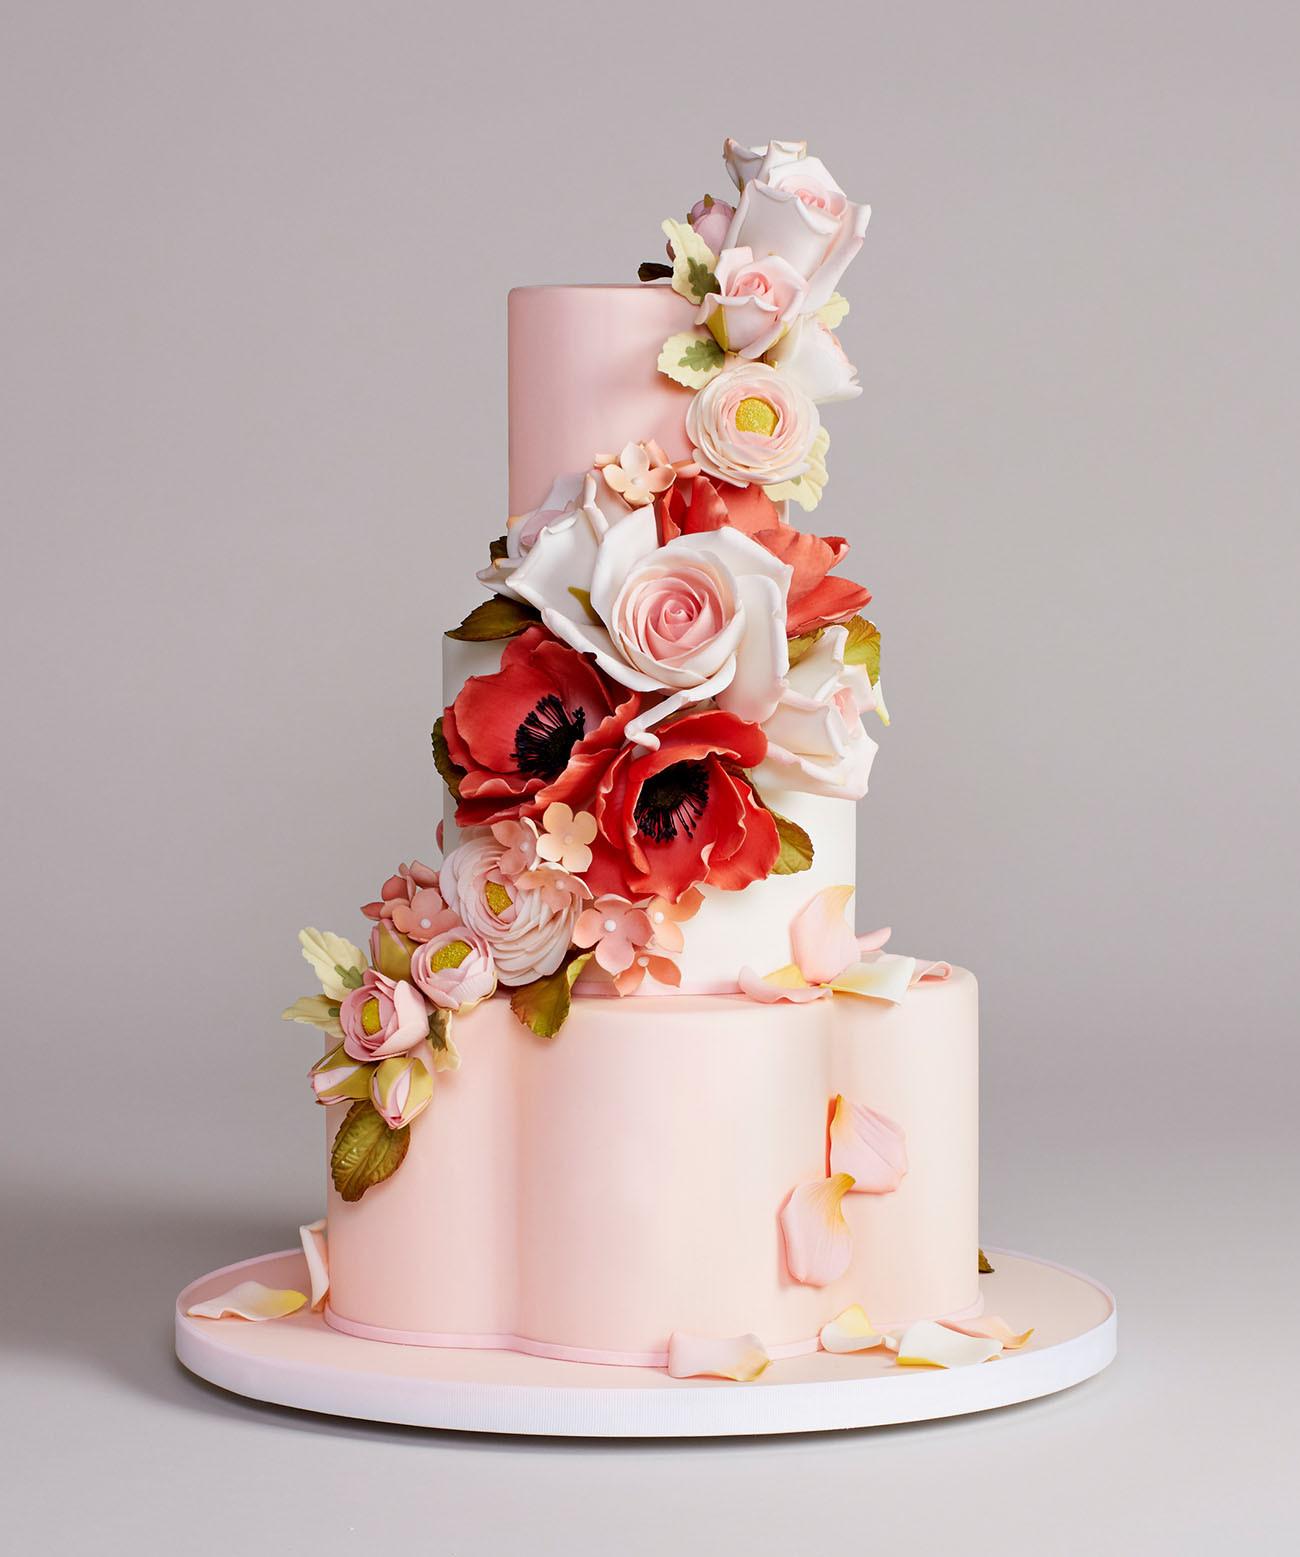 Stunning Wedding Cakes  Bottega Louie s Stunning Wedding Cake Collection Green